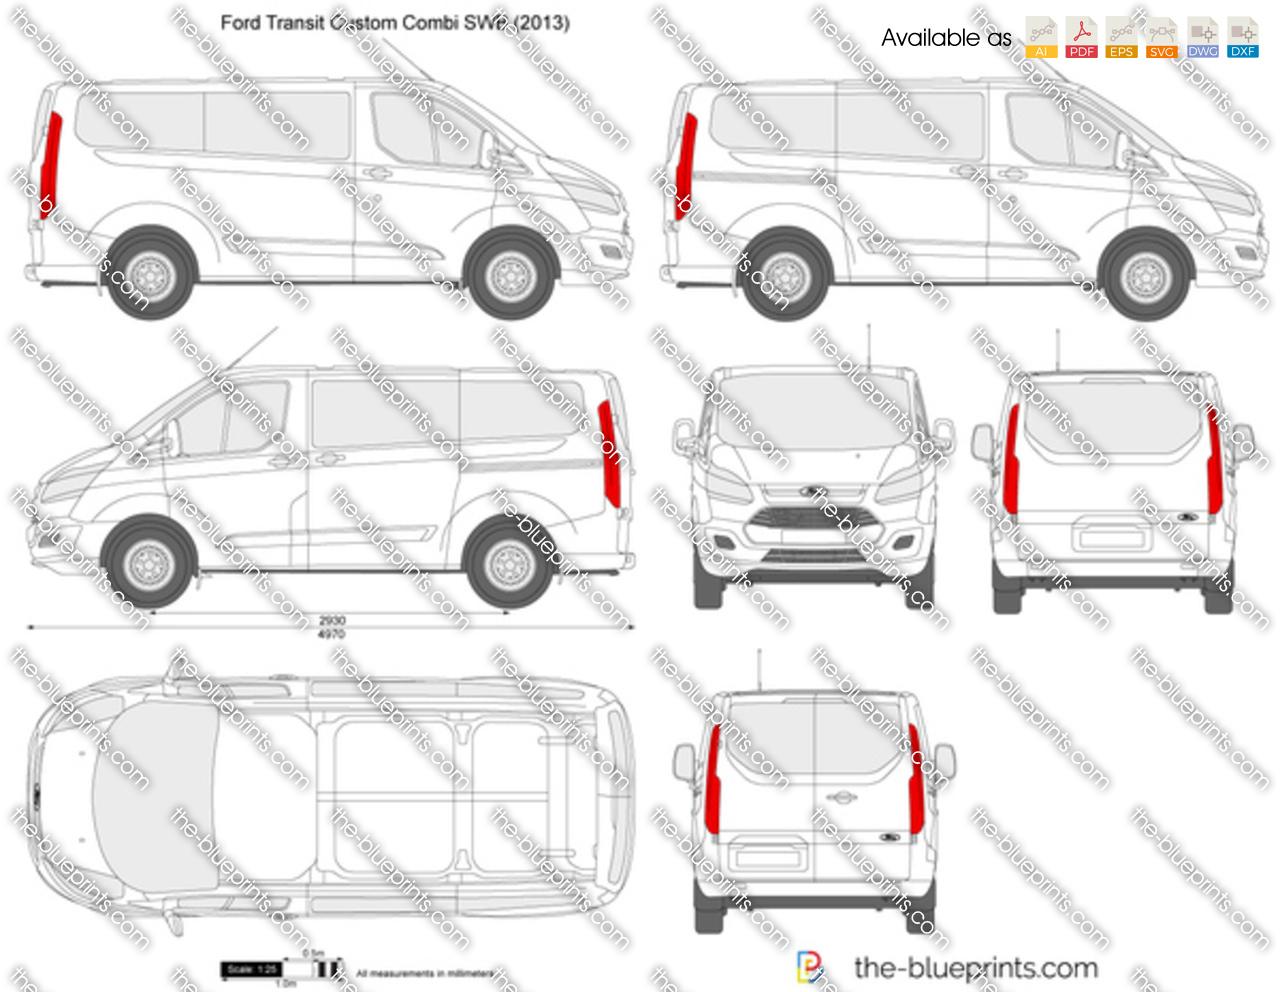 Ford Transit Custom Combi SWB 2016